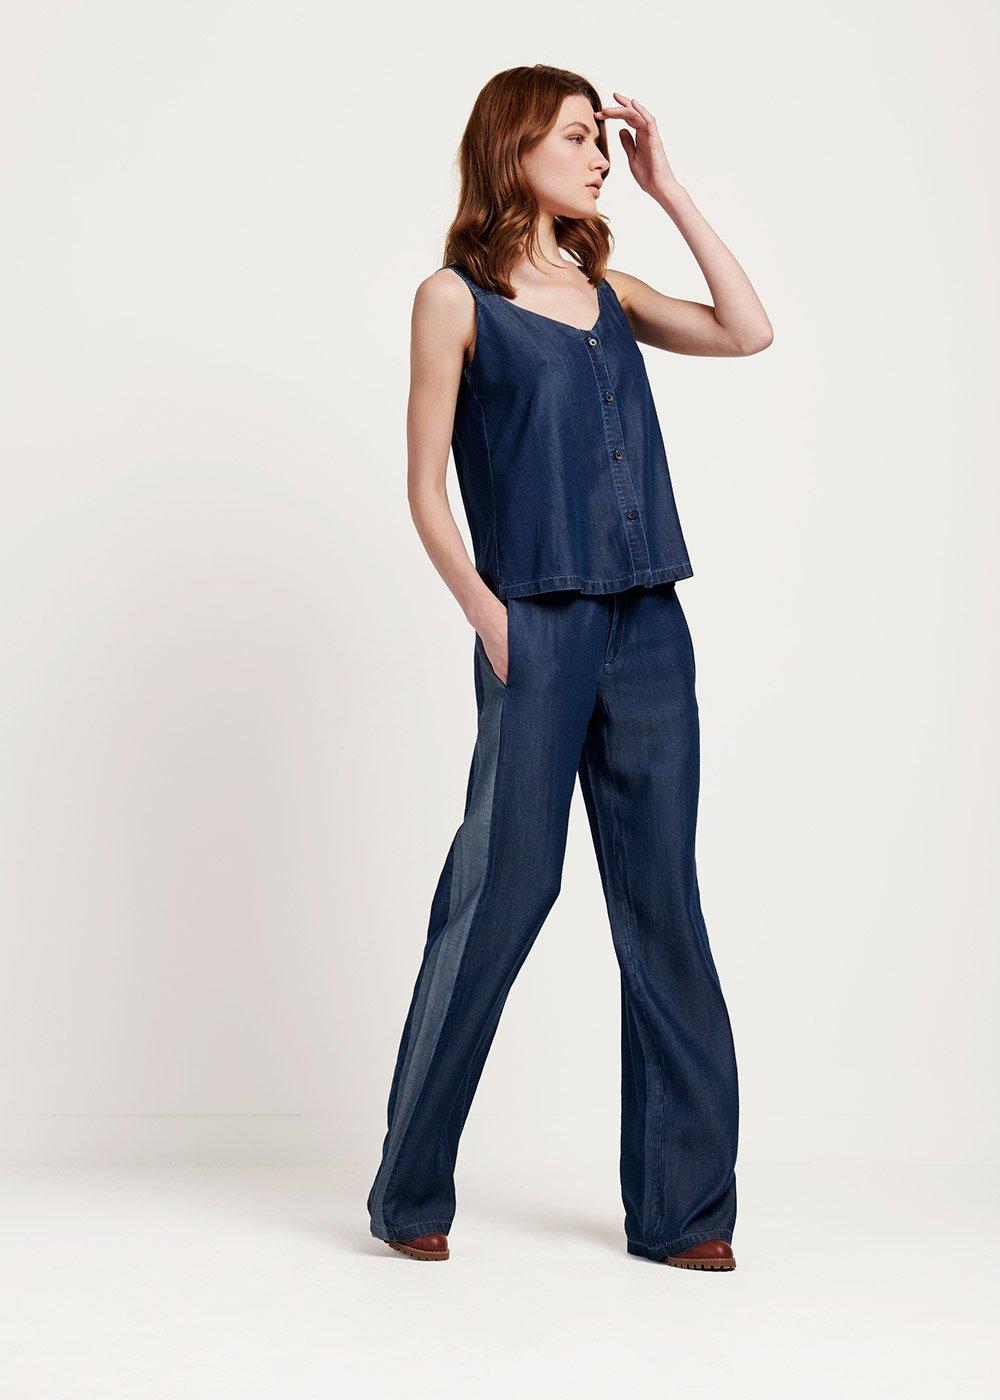 Pantalone Parky gamba larga con fascia a contrasto - Dark Denim - Donna